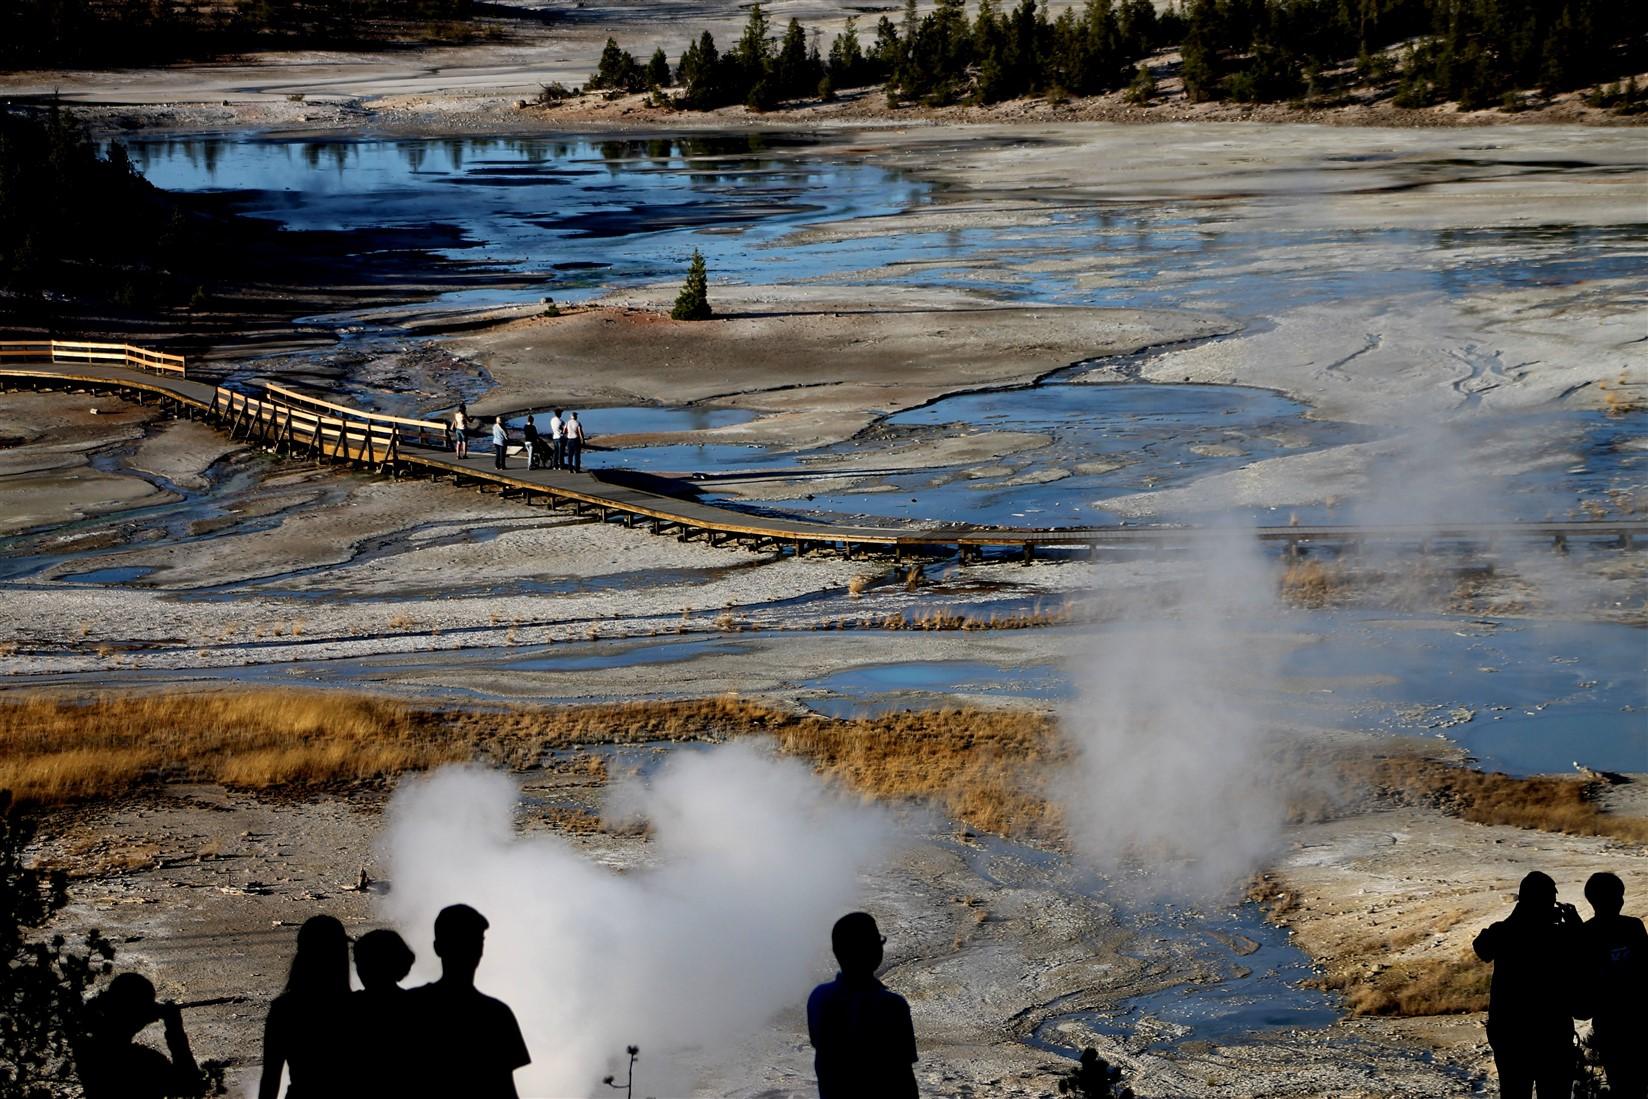 2015 09 12 197 Yellowstone National Park WY.jpg